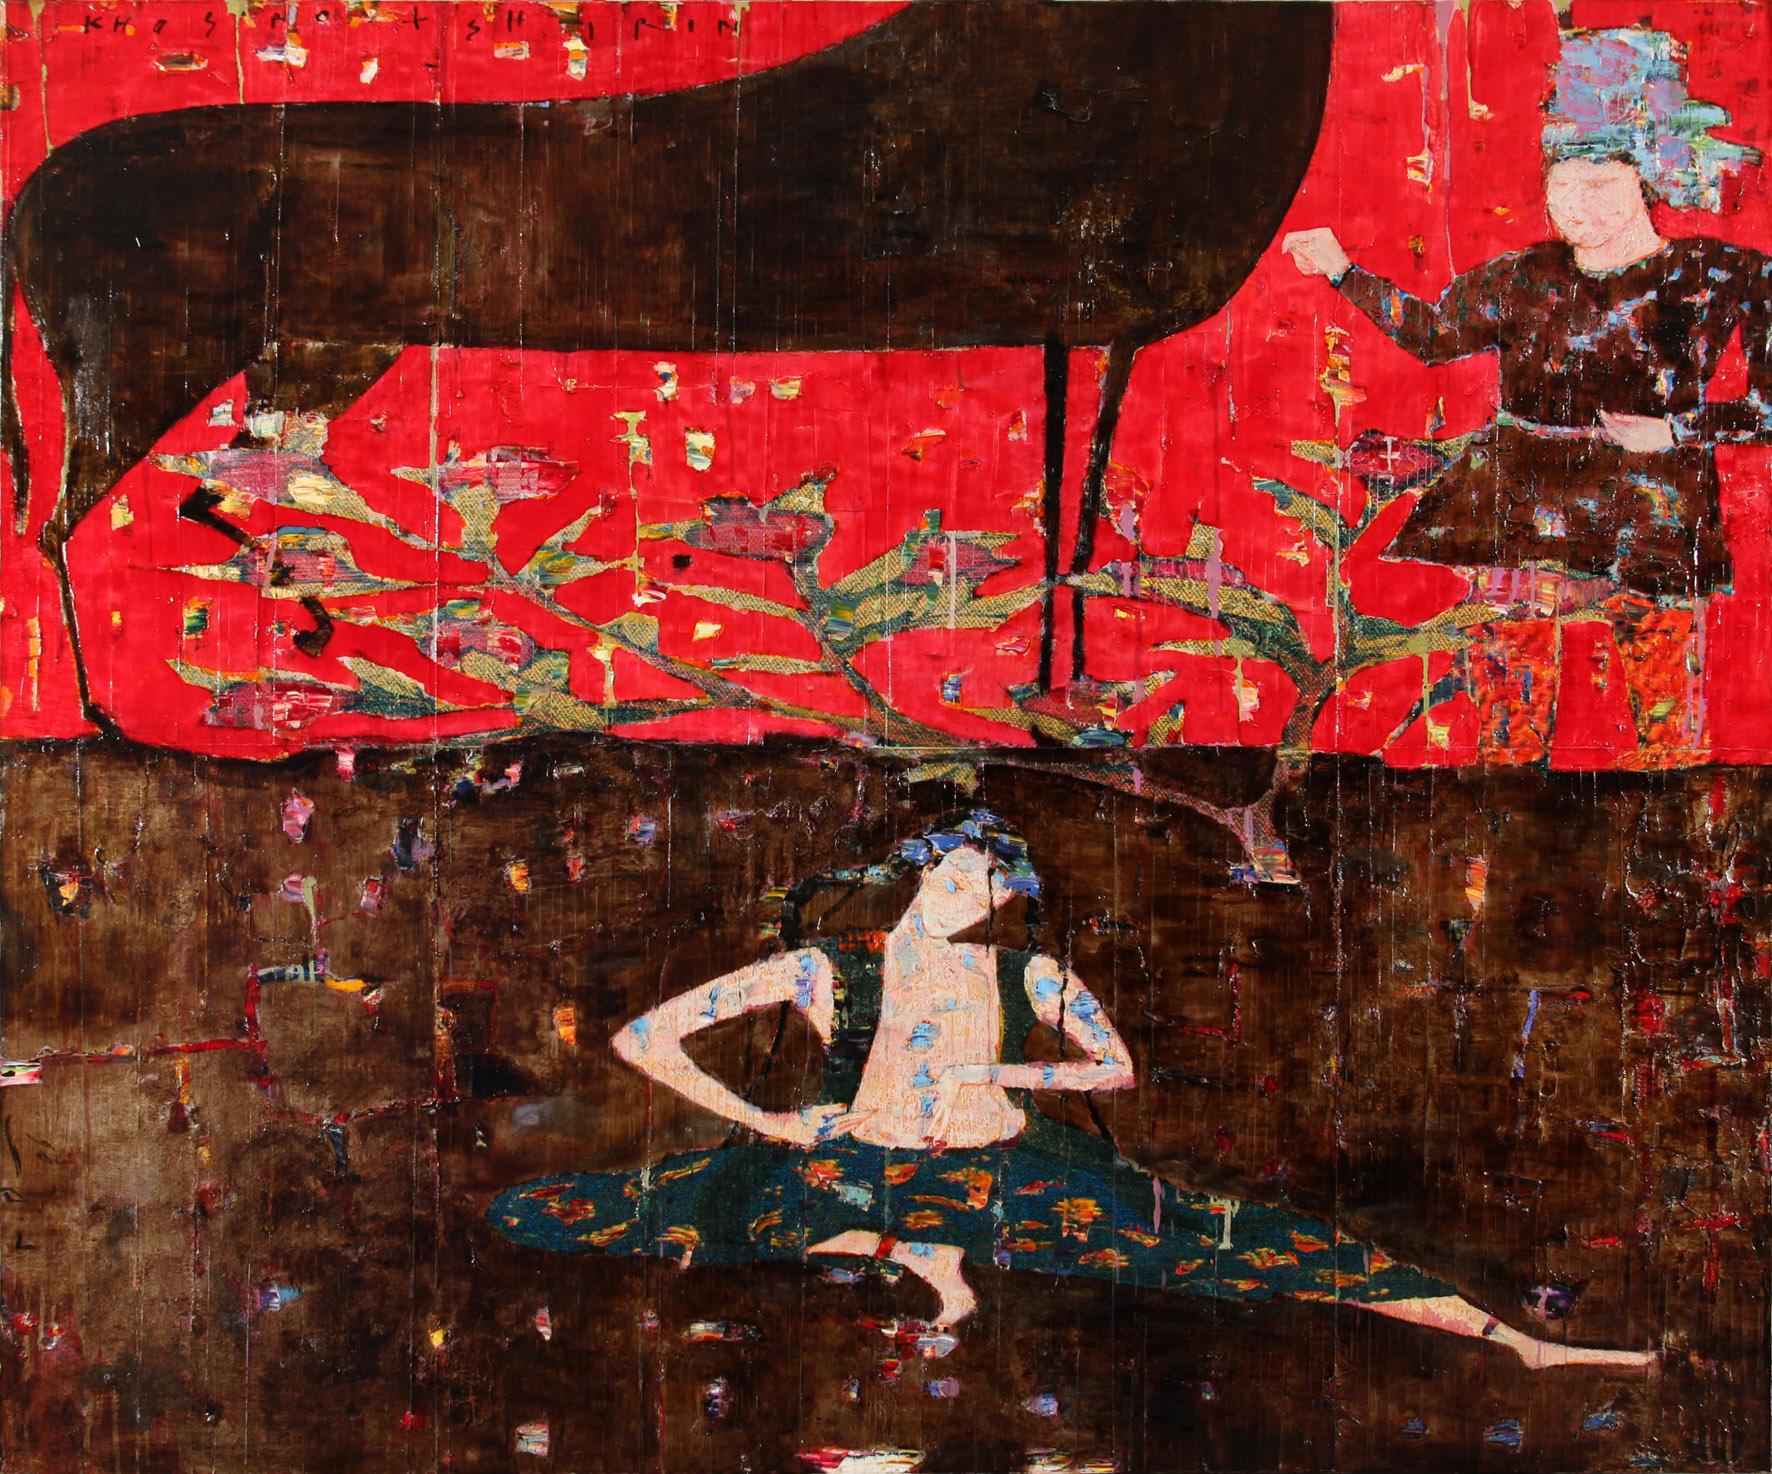 Reza Derakshani - Khosrow and Shirin Series, Mixed Media on Canvas, 150x180cm, 2009, 32000dollars.jpg